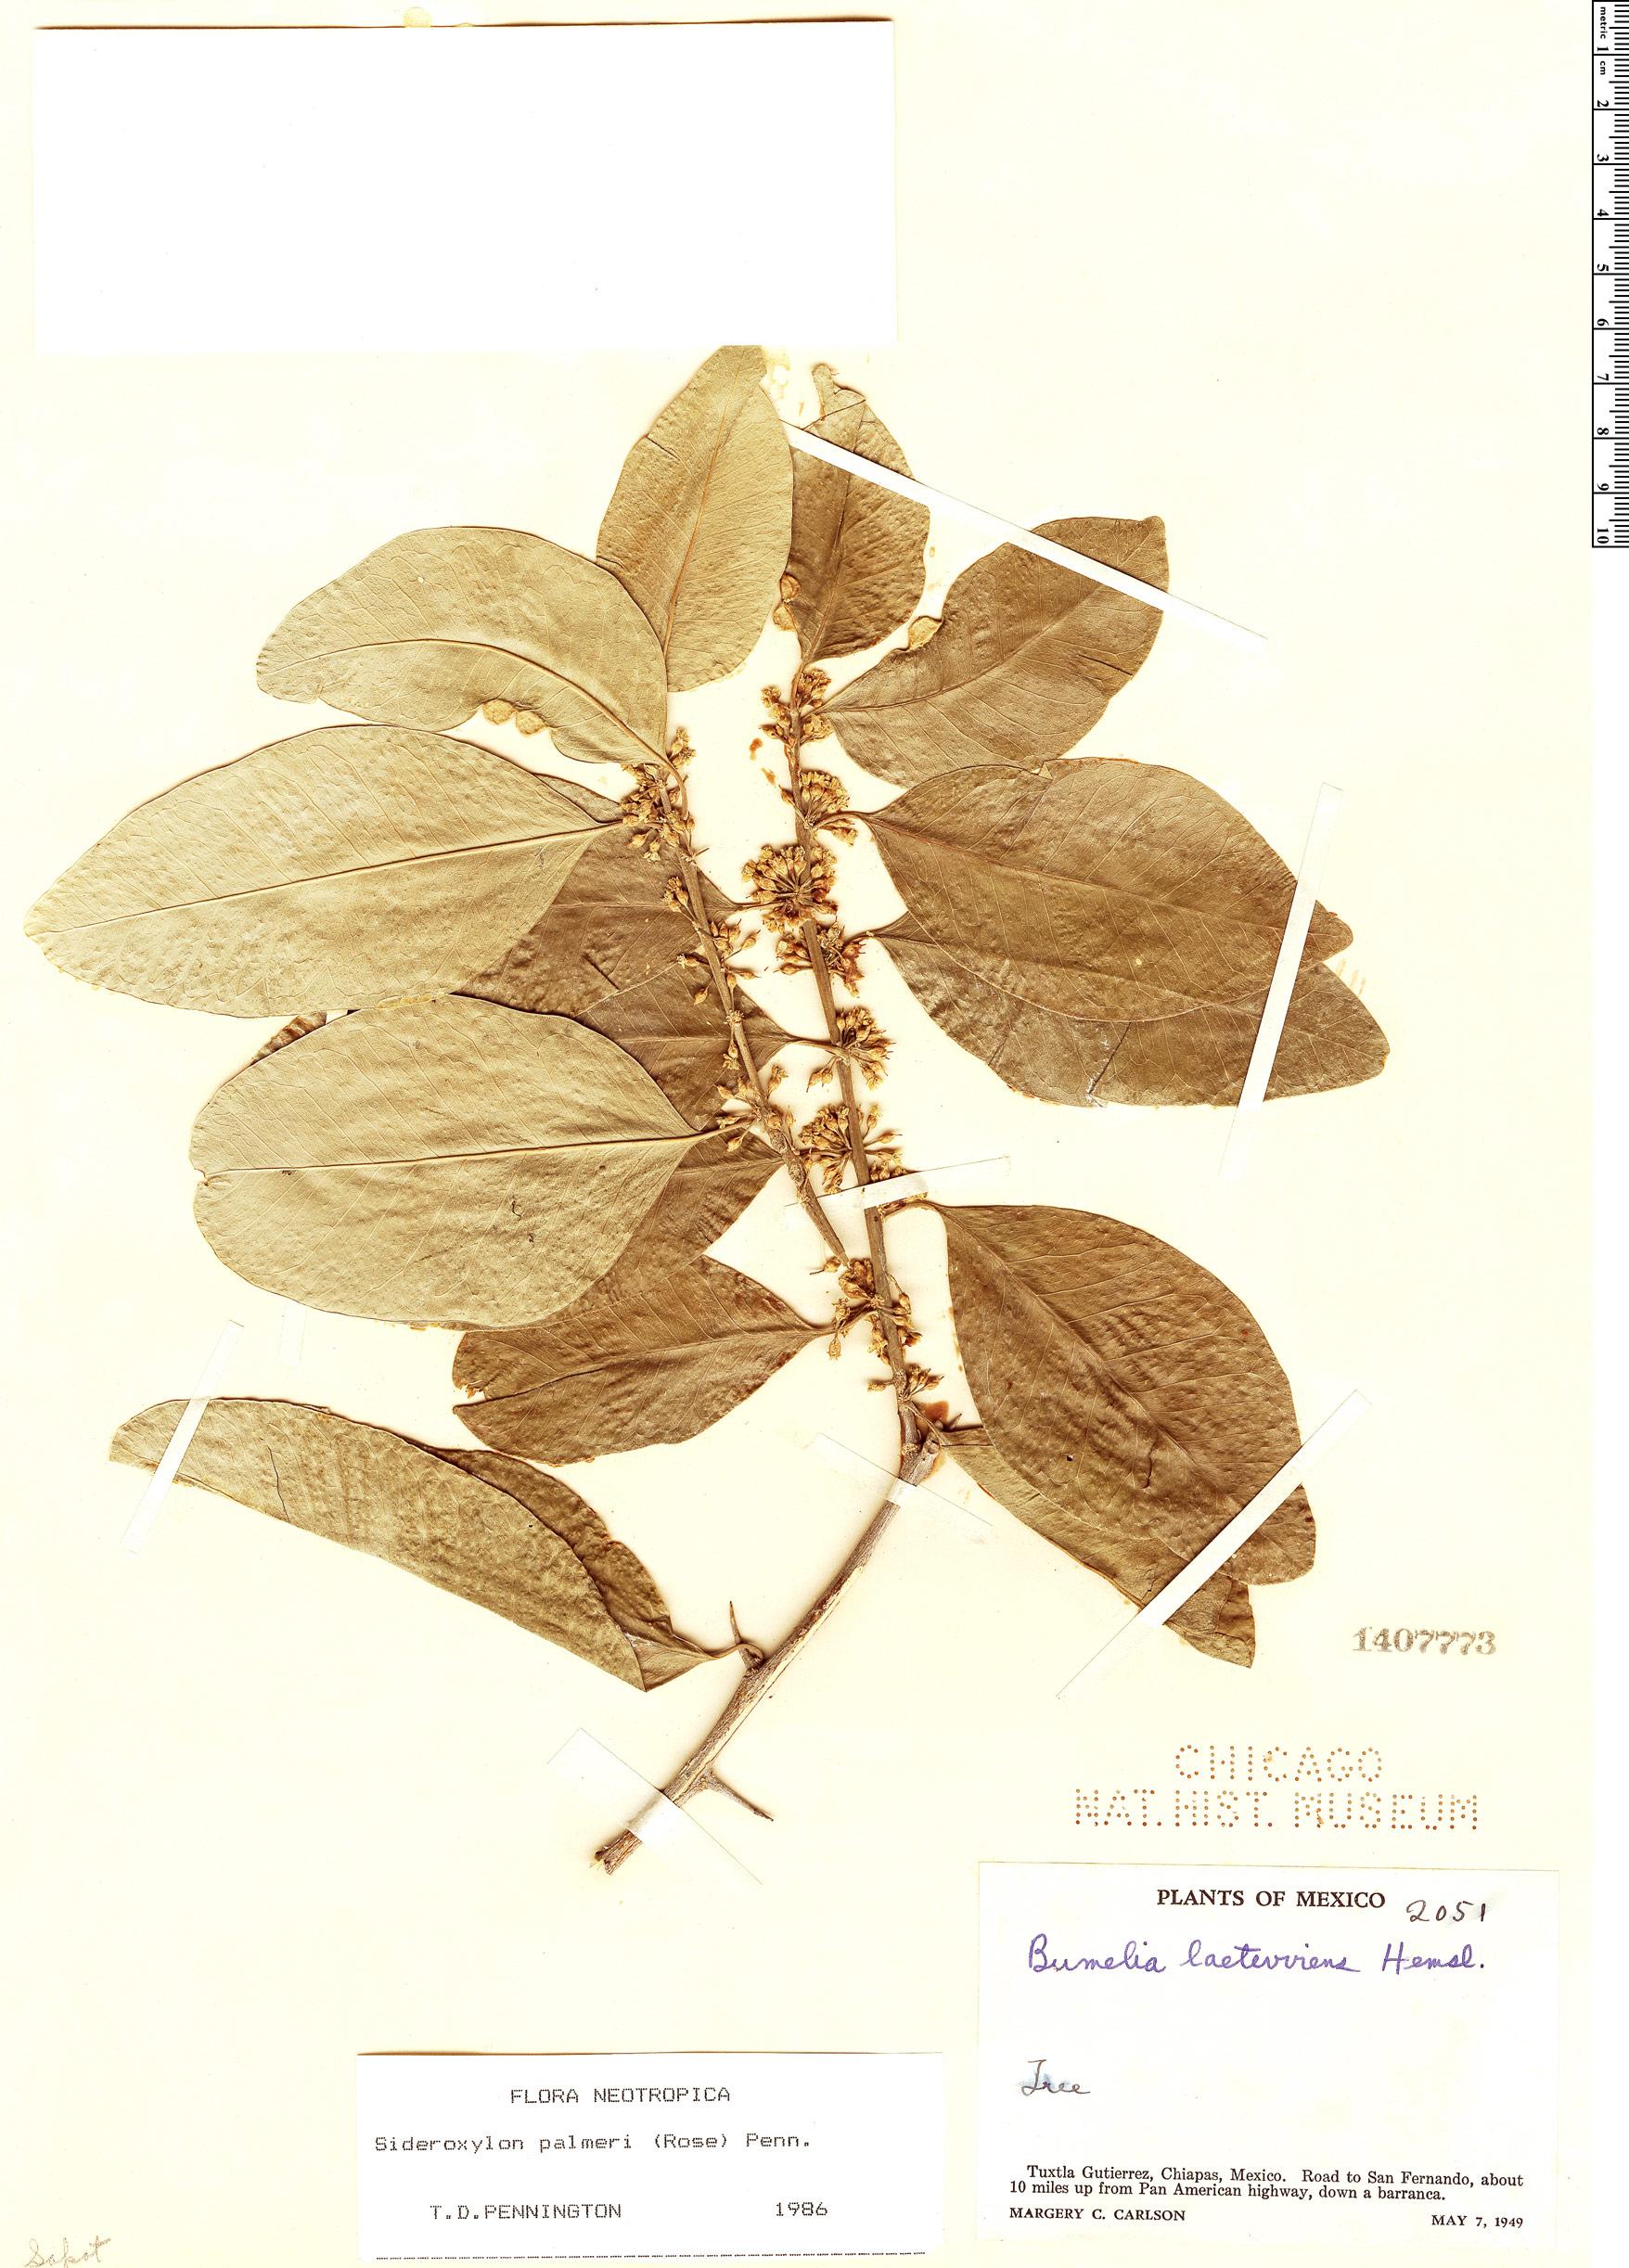 Specimen: Sideroxylon palmeri